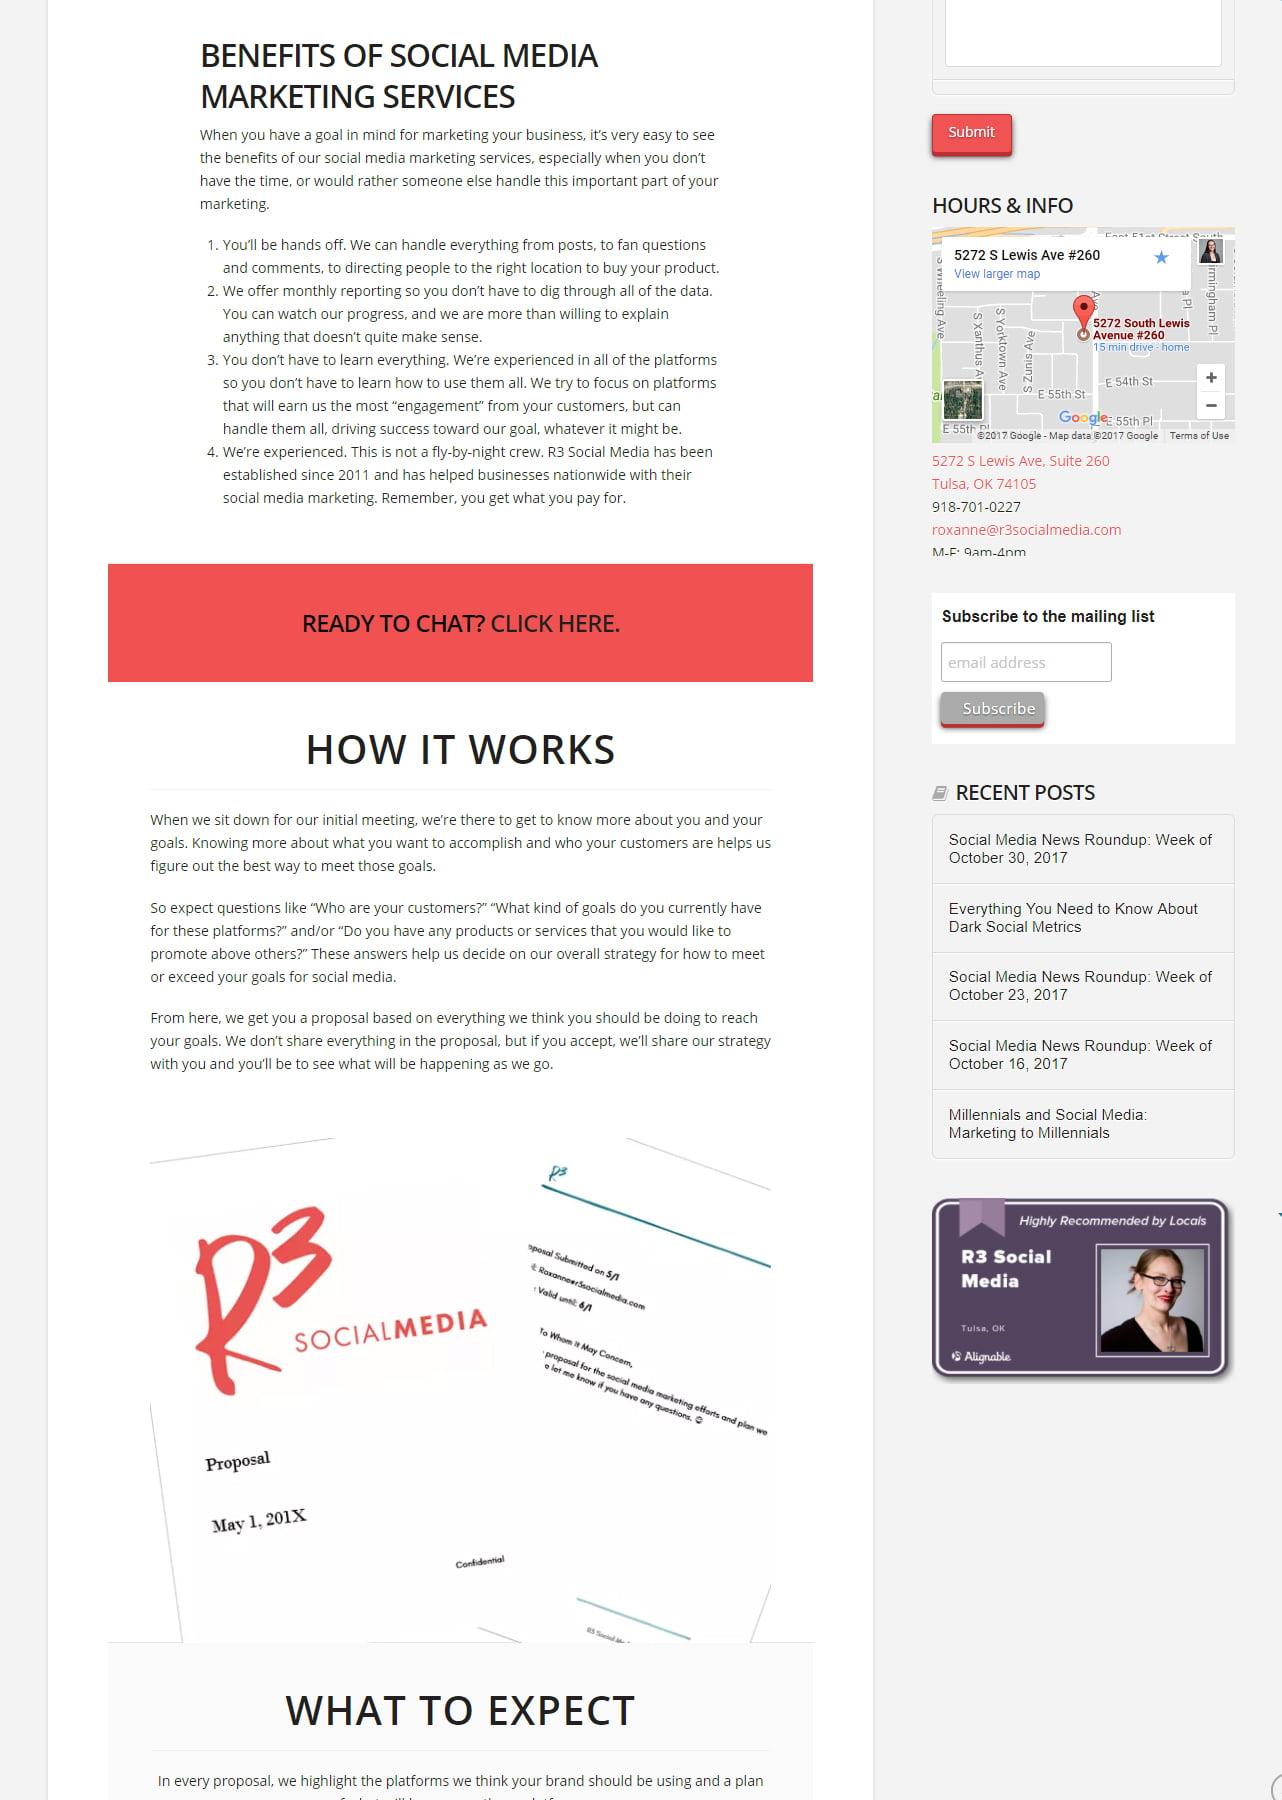 A/B Split Testing - Social Media Marketing Services Landing Pages